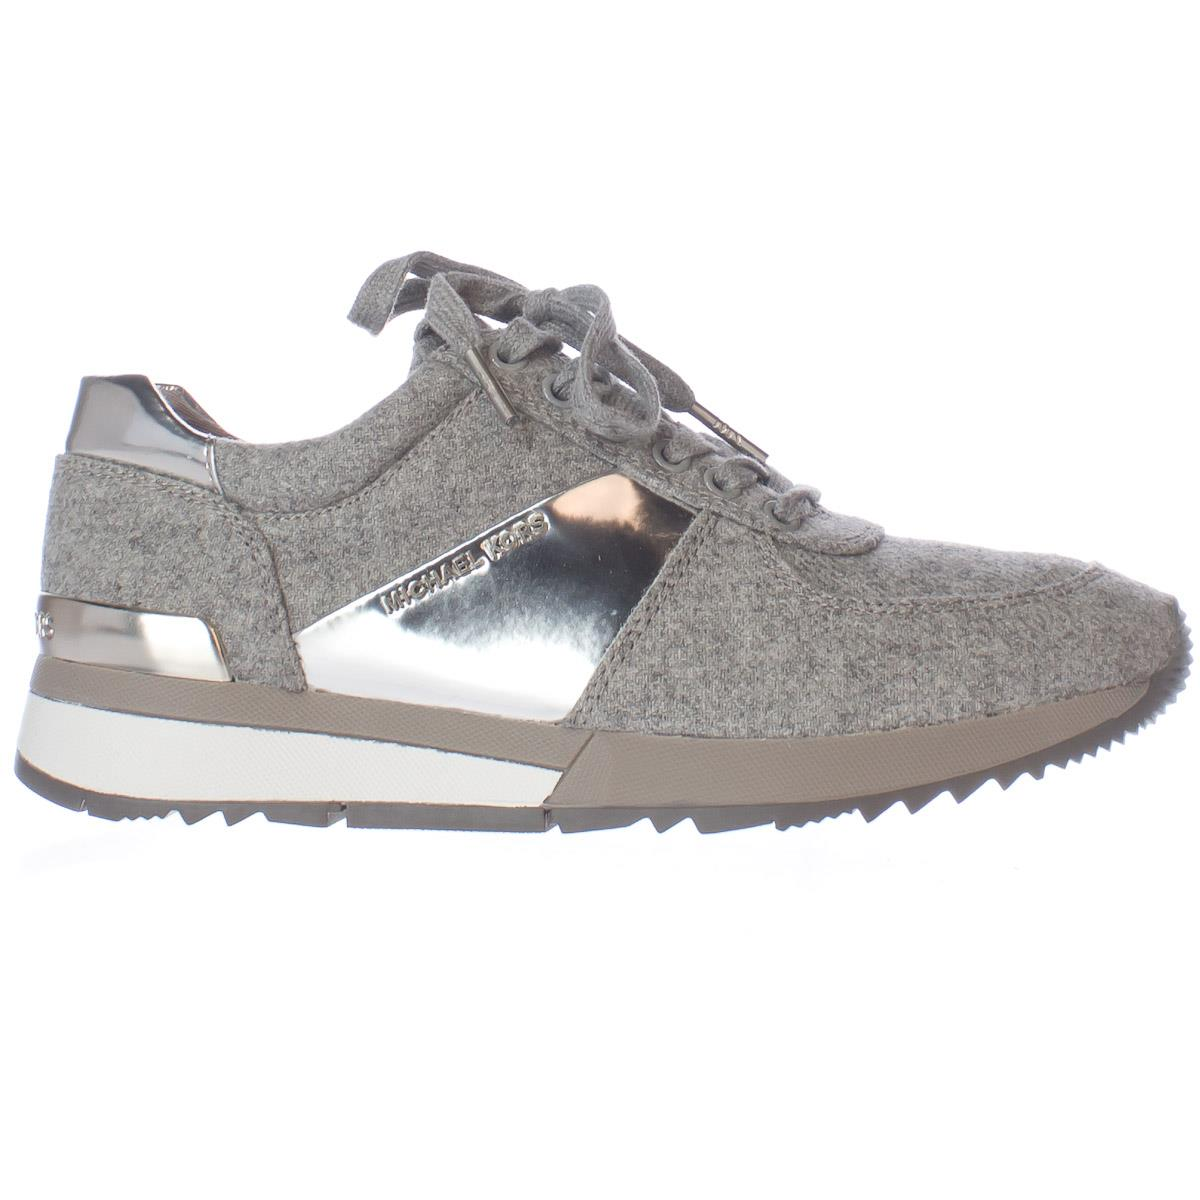 61b2bdeb48b06 Michael Kors - Womens MICHAEL Michael Kors Allie Trainer Sneakers - Pearl  Grey Silver - Walmart.com